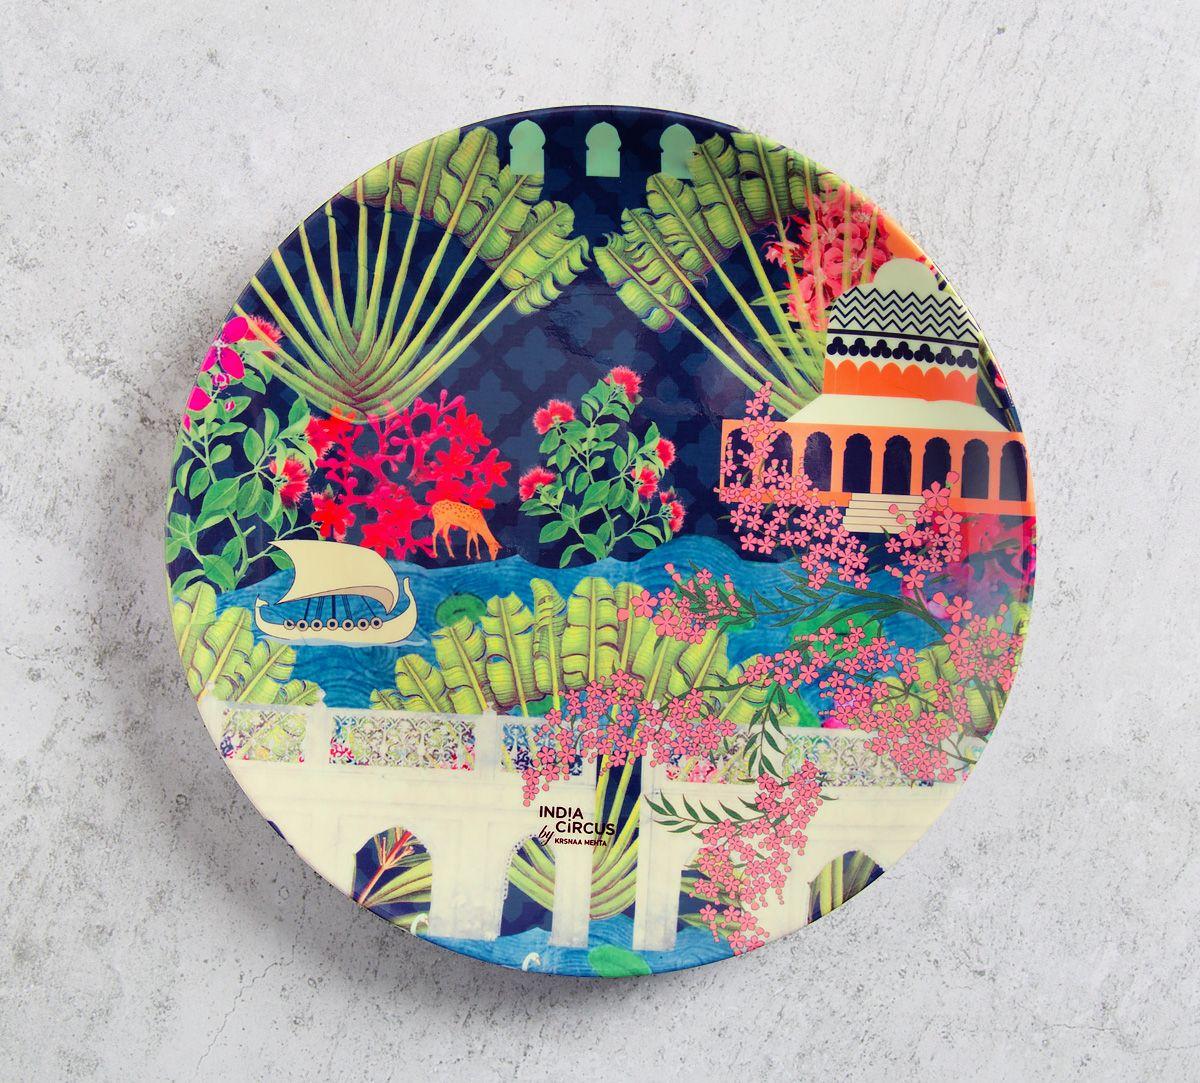 Banks of Silvassa 8 inch Decorative and Snacks Platter